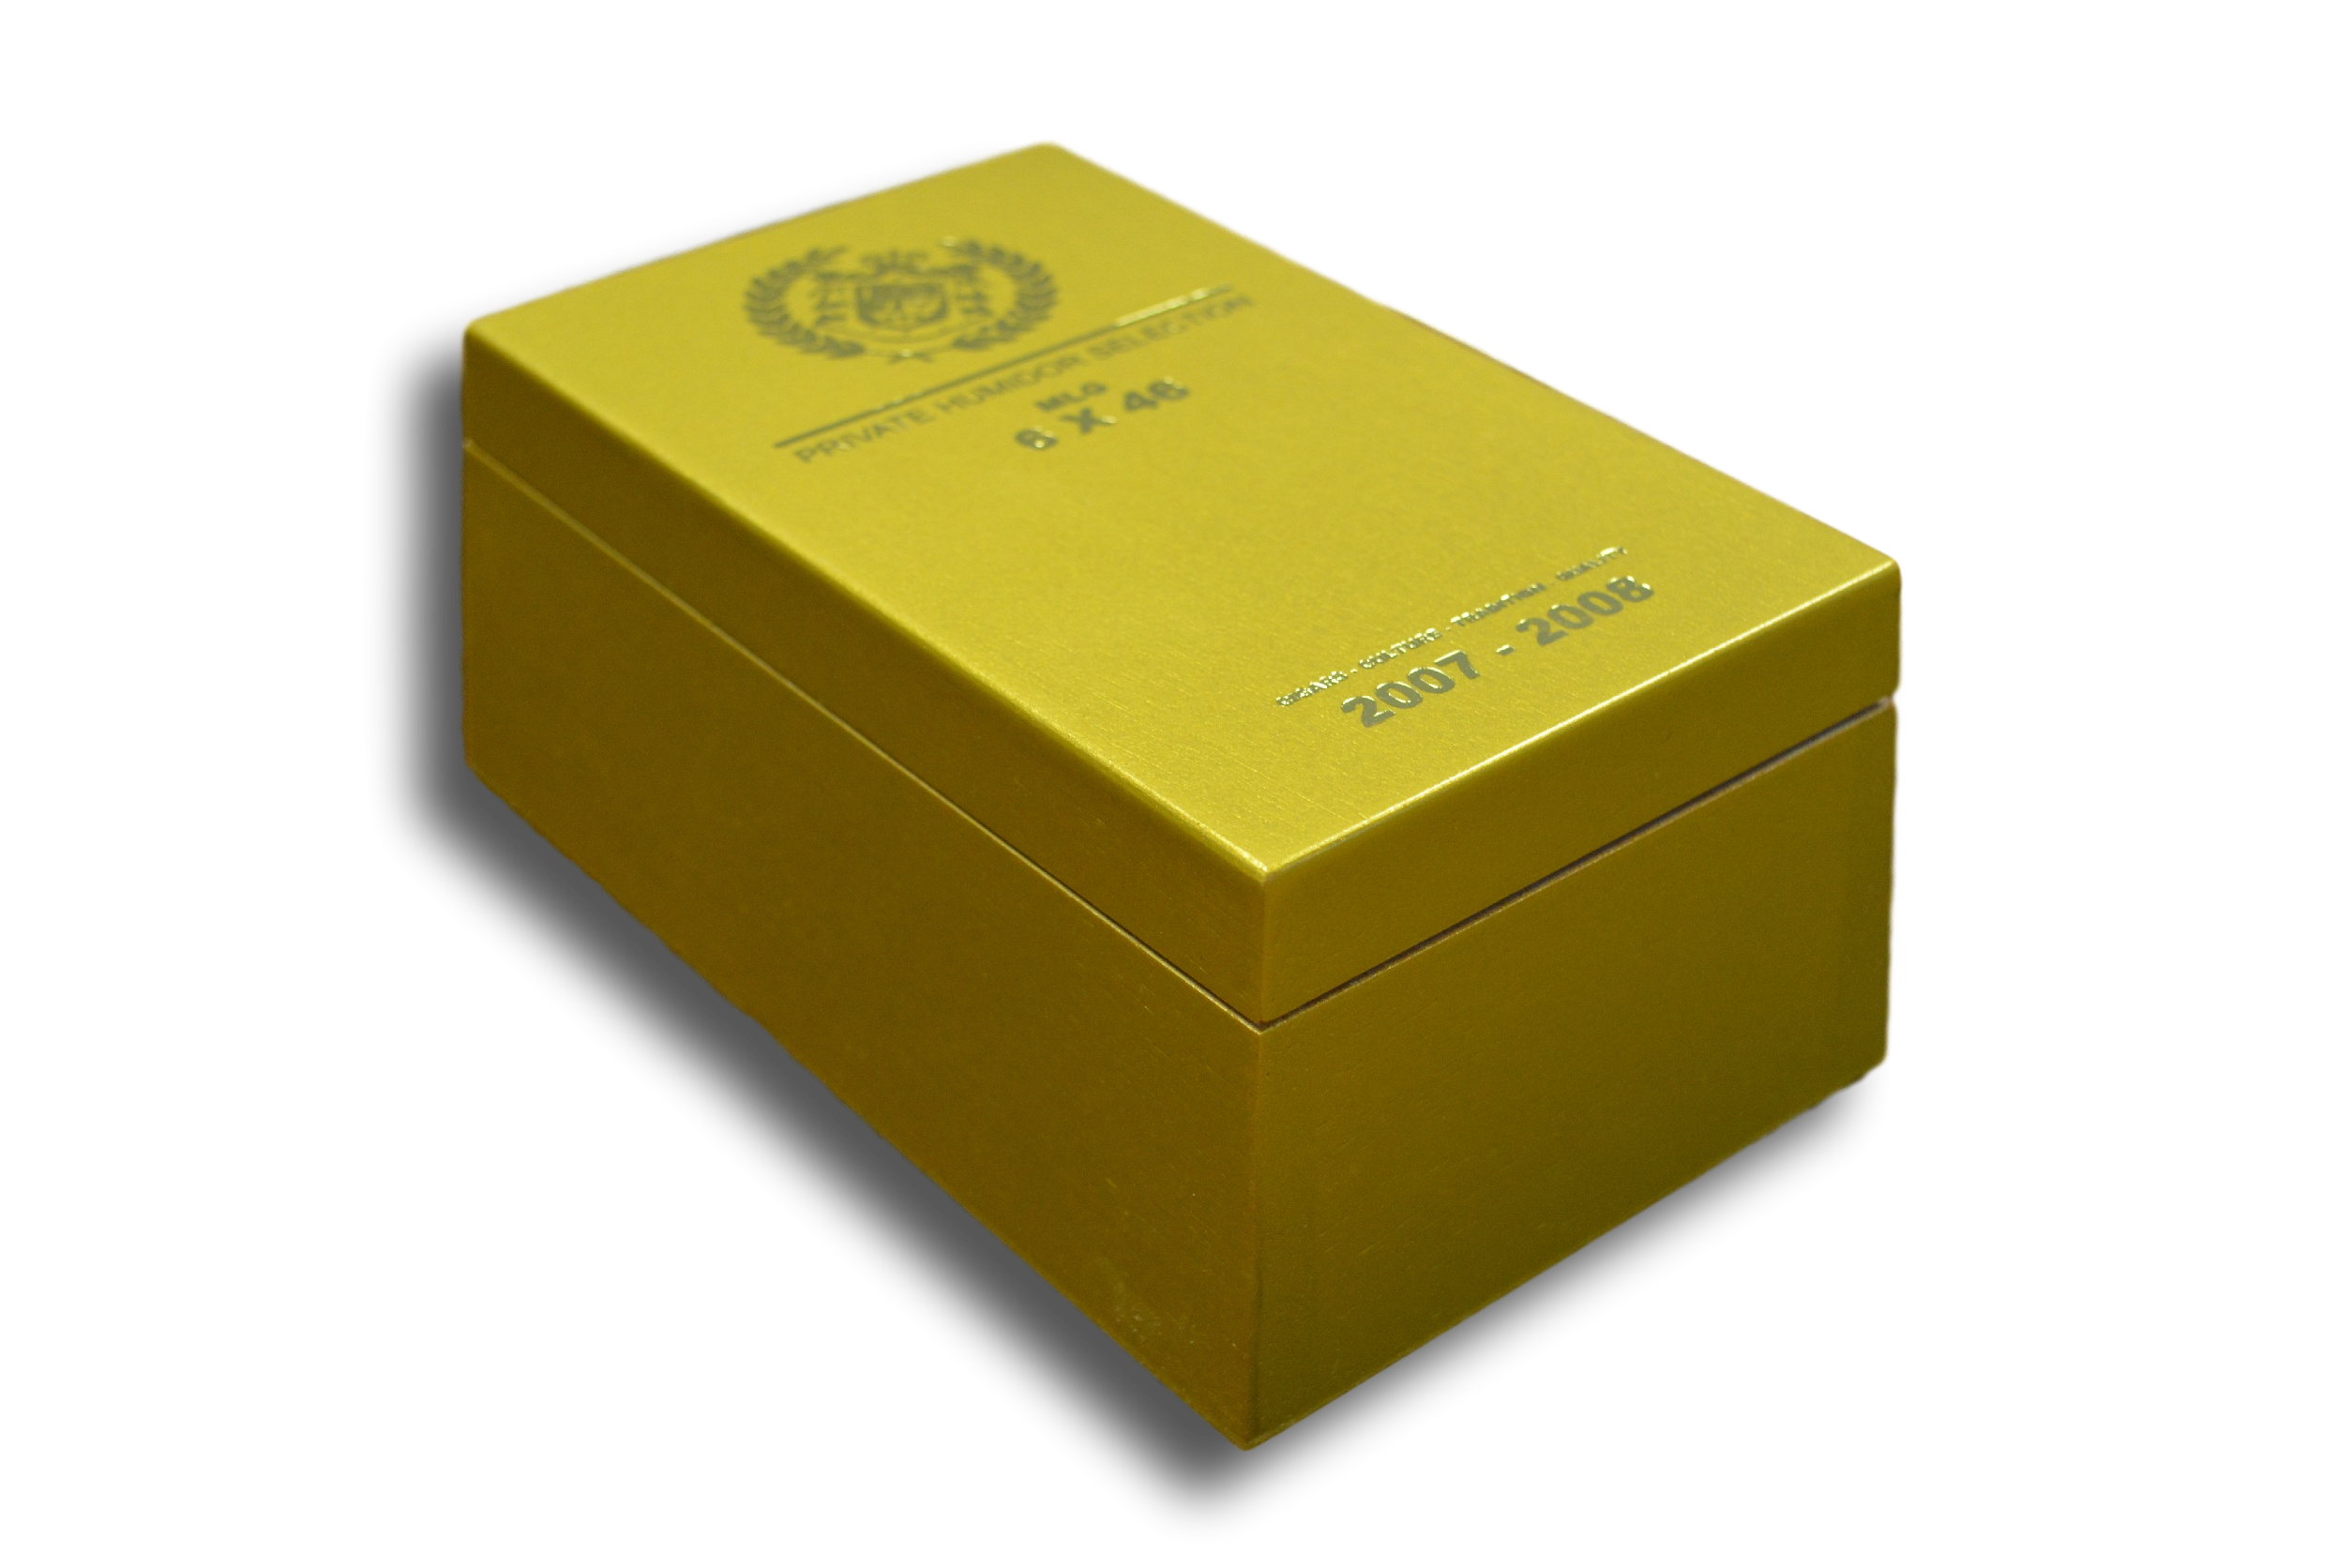 Cigar News: Gran Habano Private Humidor Selection 2007-2008 MLG Corona Gorda Announced